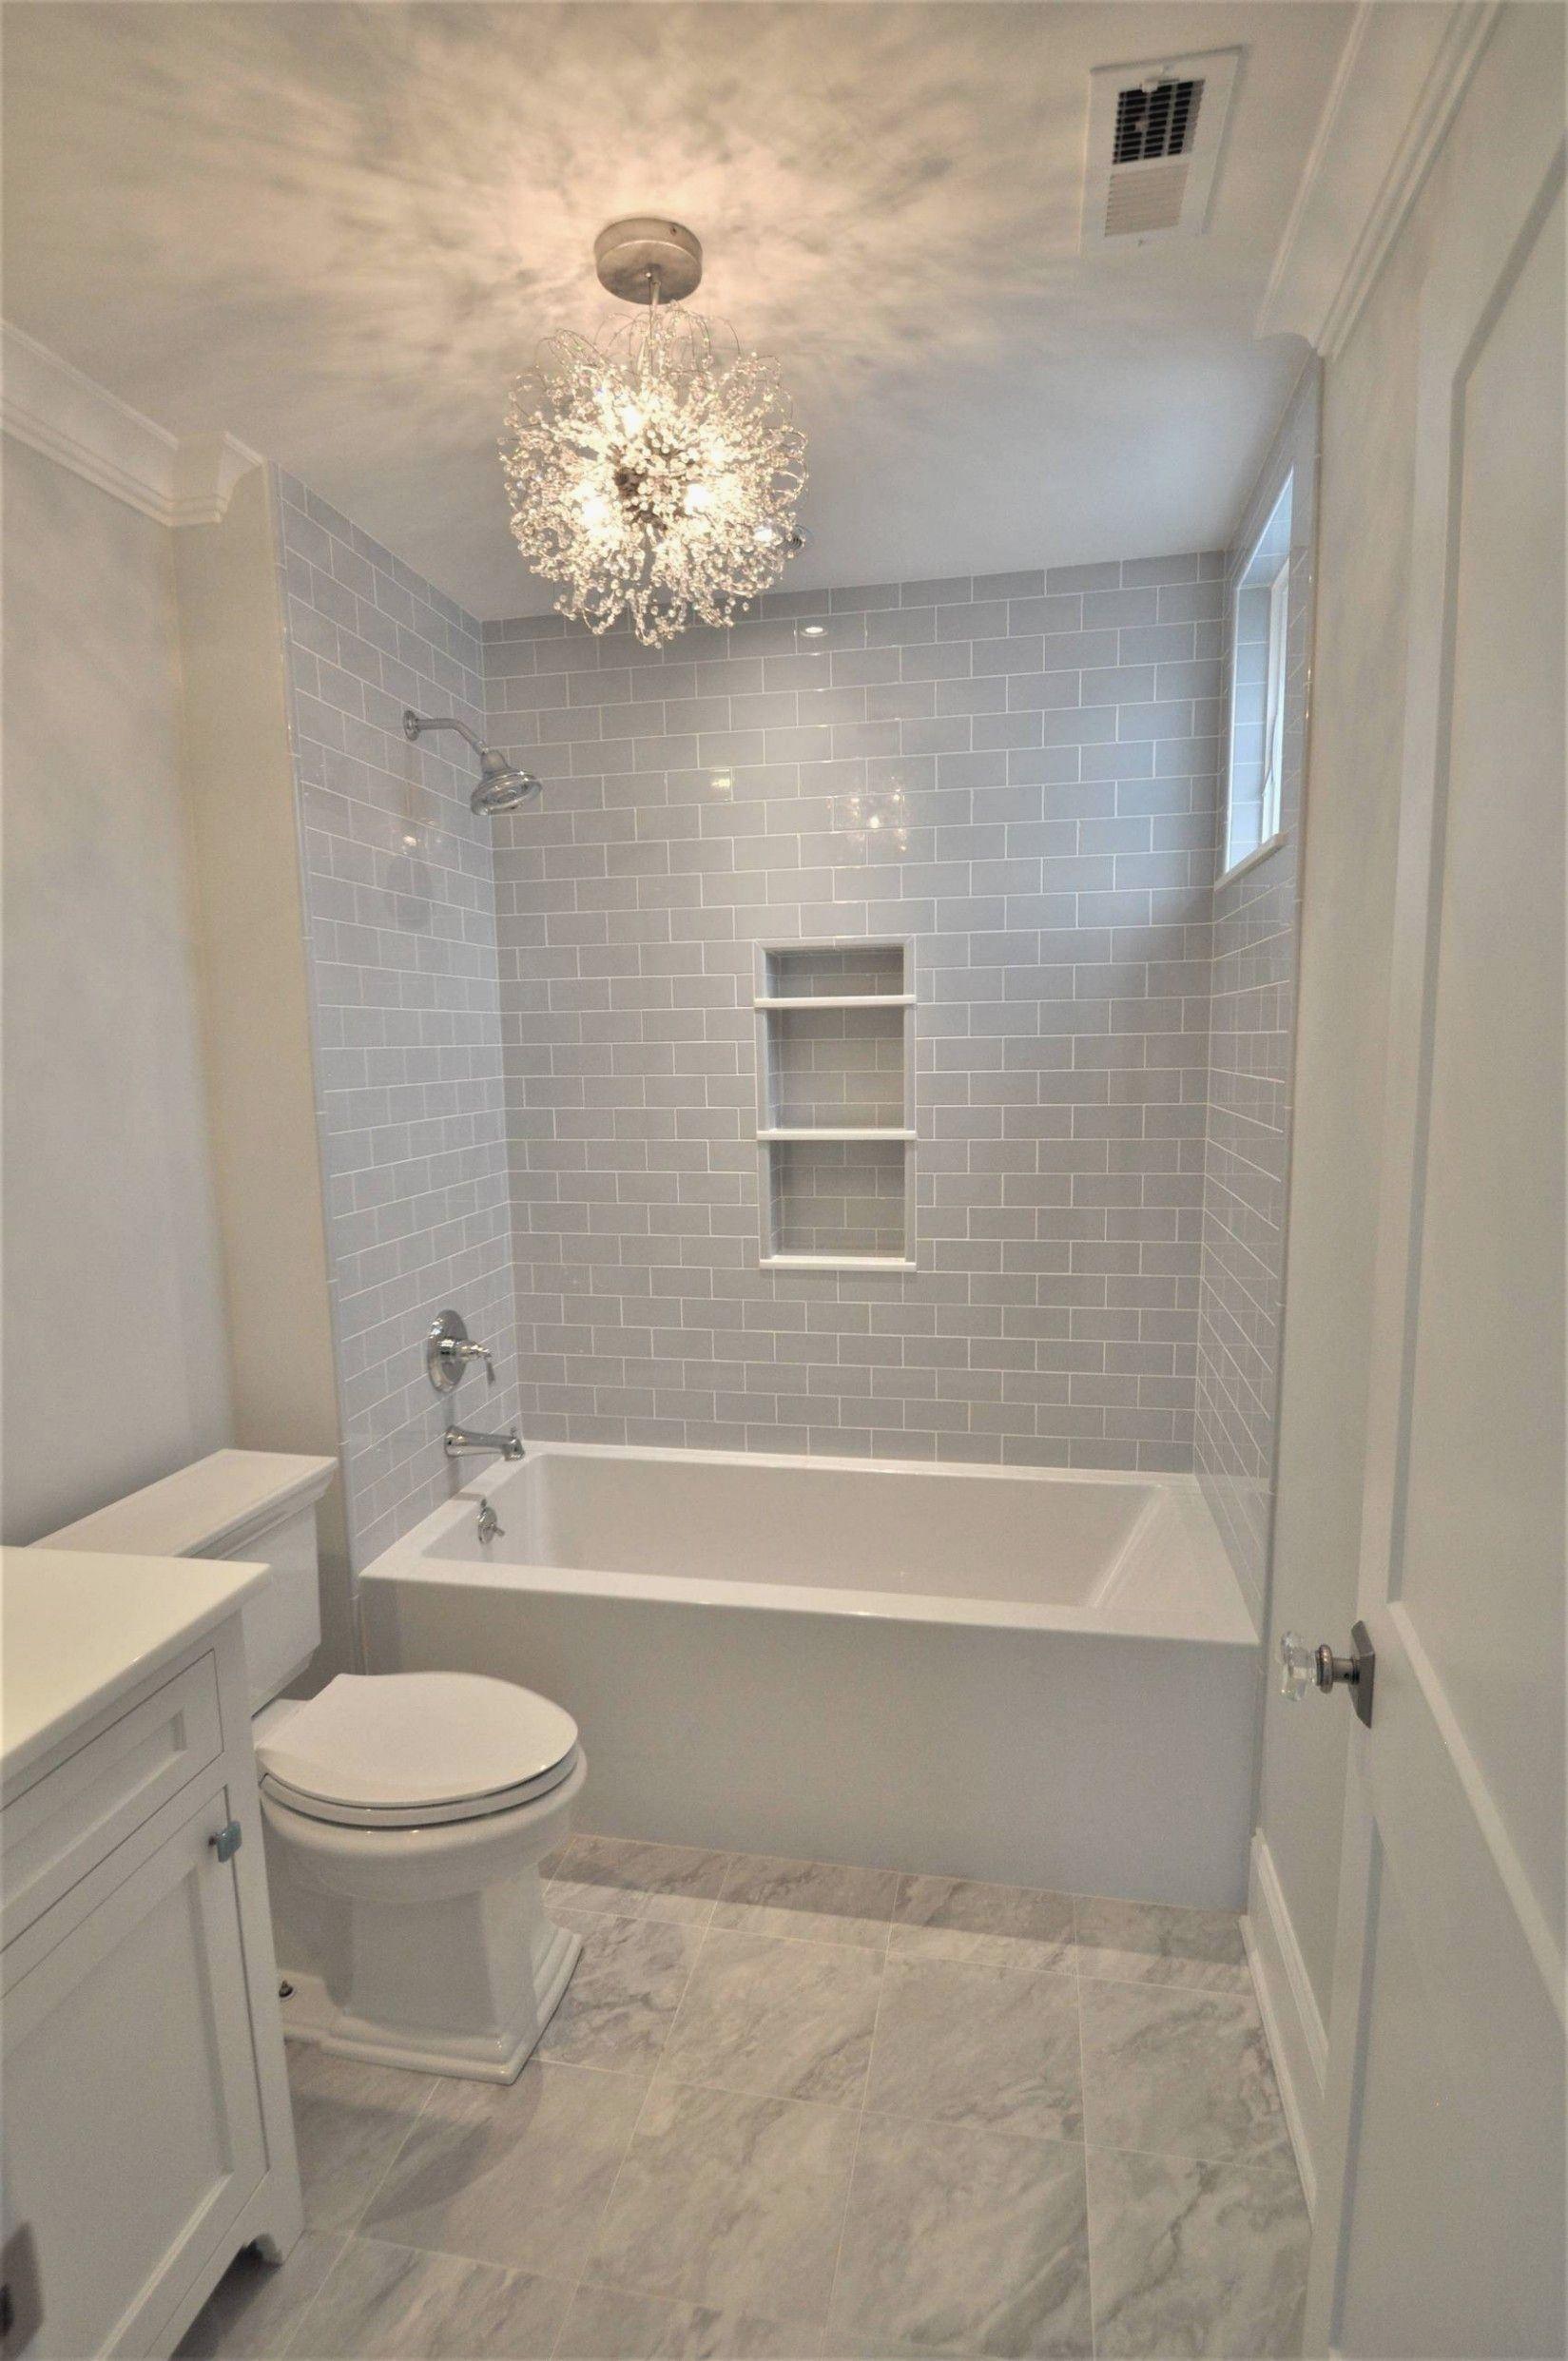 Bathroom Idea 790030028322122781 In 2020 Bathroom Design Small Small Bathroom Bathroom Remodel Shower